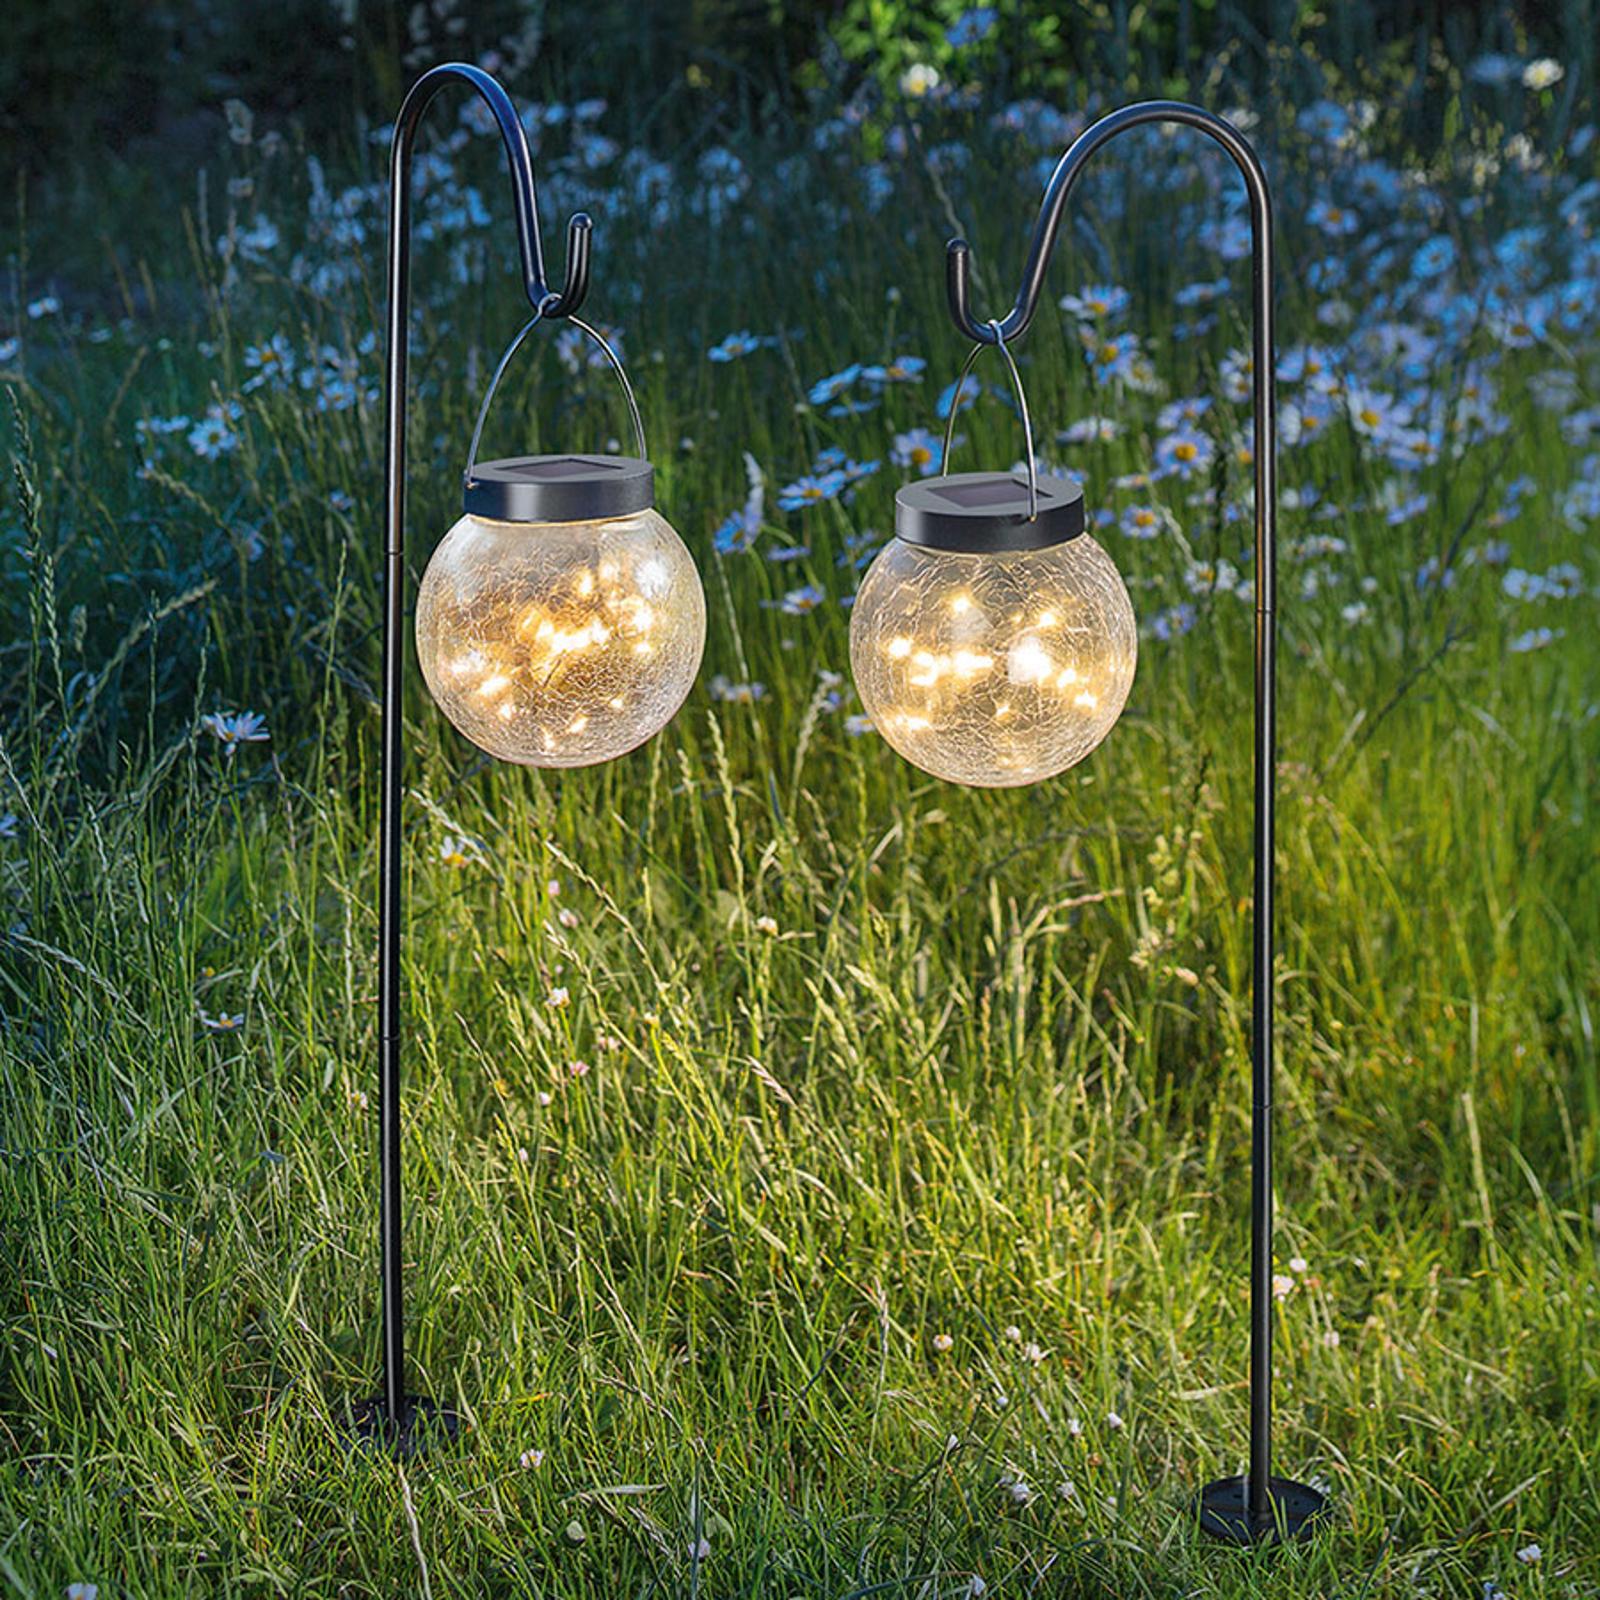 Soldriven dekorationsbelysning Smart Globe 2-pack